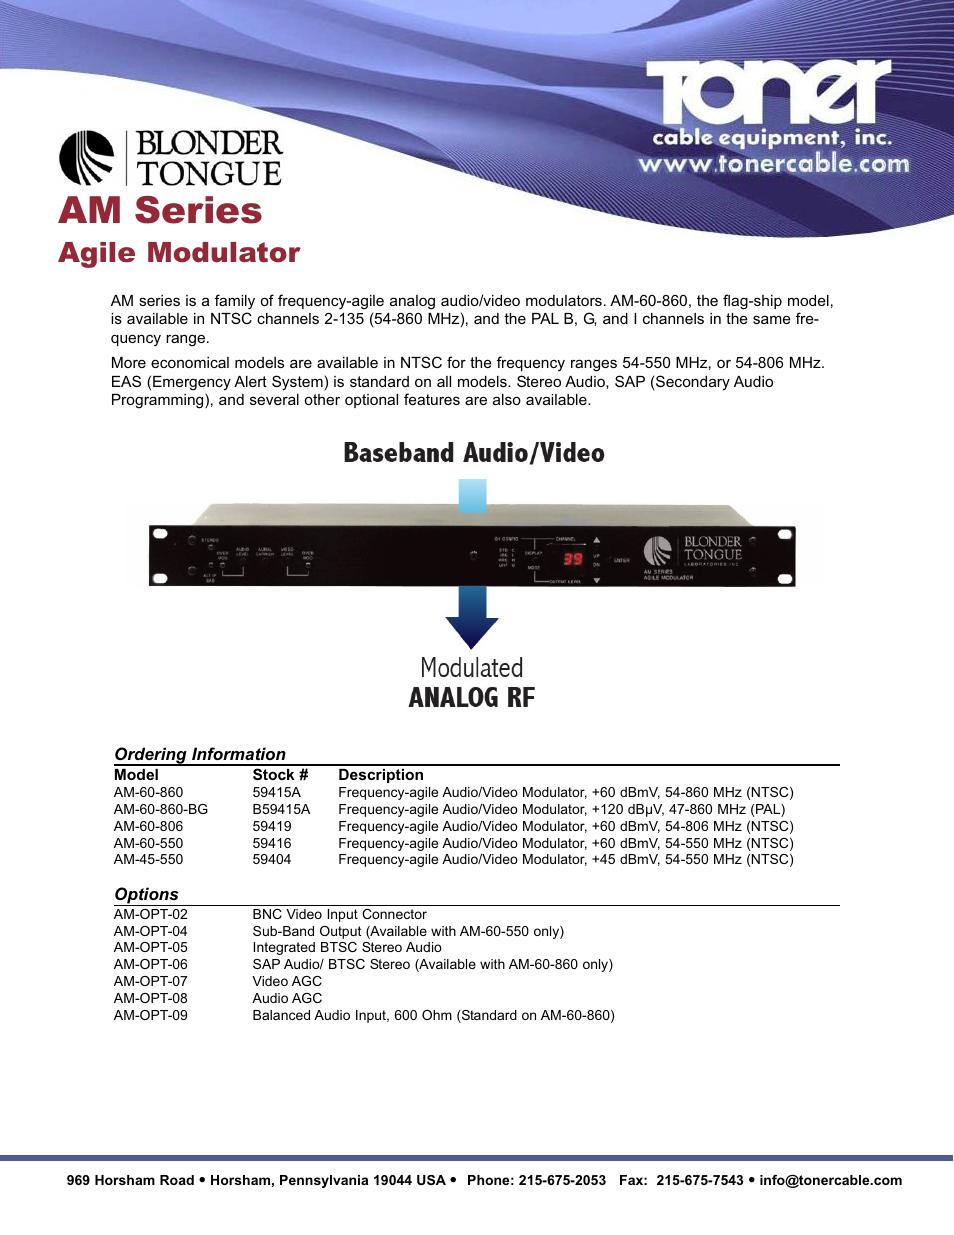 Toner Cable AM Series Agile Modulators User Manual | 2 pages